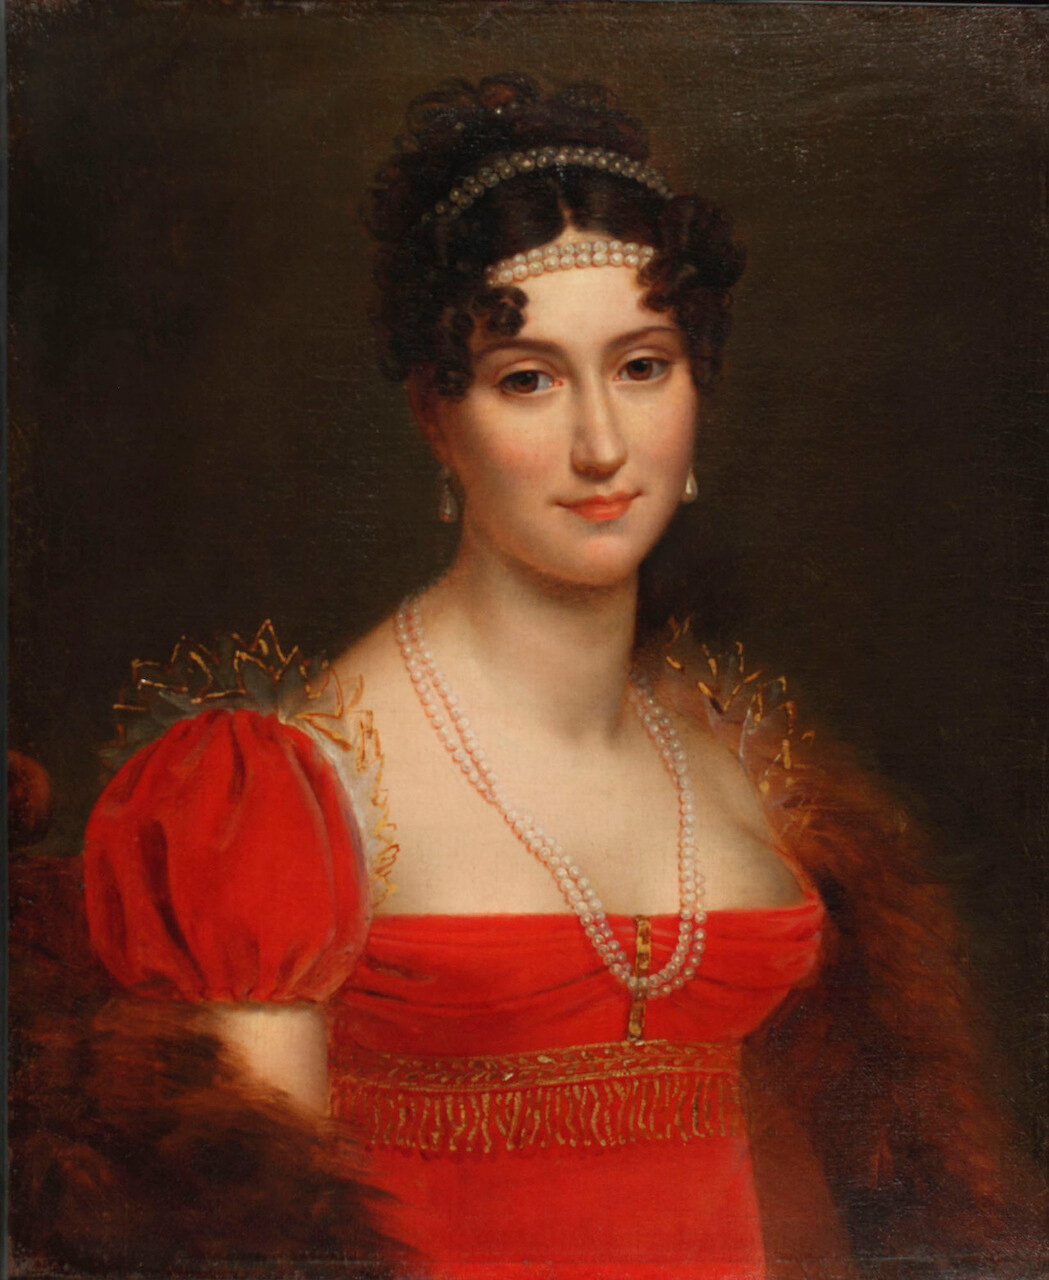 Eglee Auguie (Mrs.Michel) Ney, PrincessMoskowa, Duchess of Elchingen (1782-1856)Francois Baron Gerard (1770-1837)1808Oil on canvasAlbany Institute of History & Art, Bequest of George Clinton Genet, 1911.2.3.2